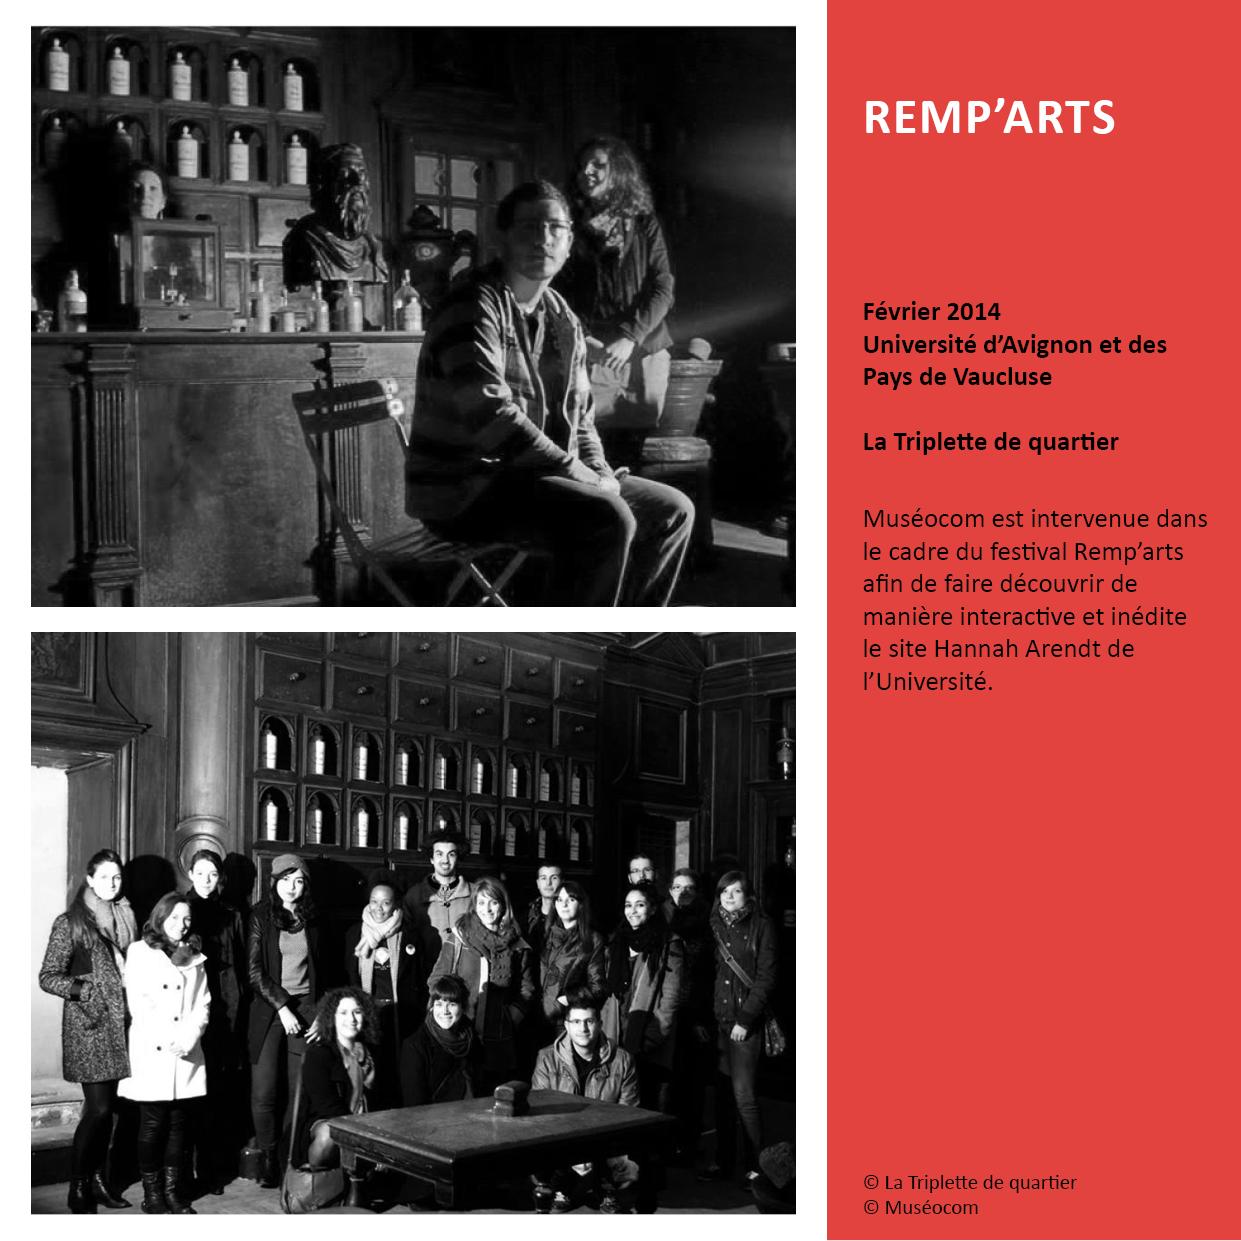 REMP'ARTS